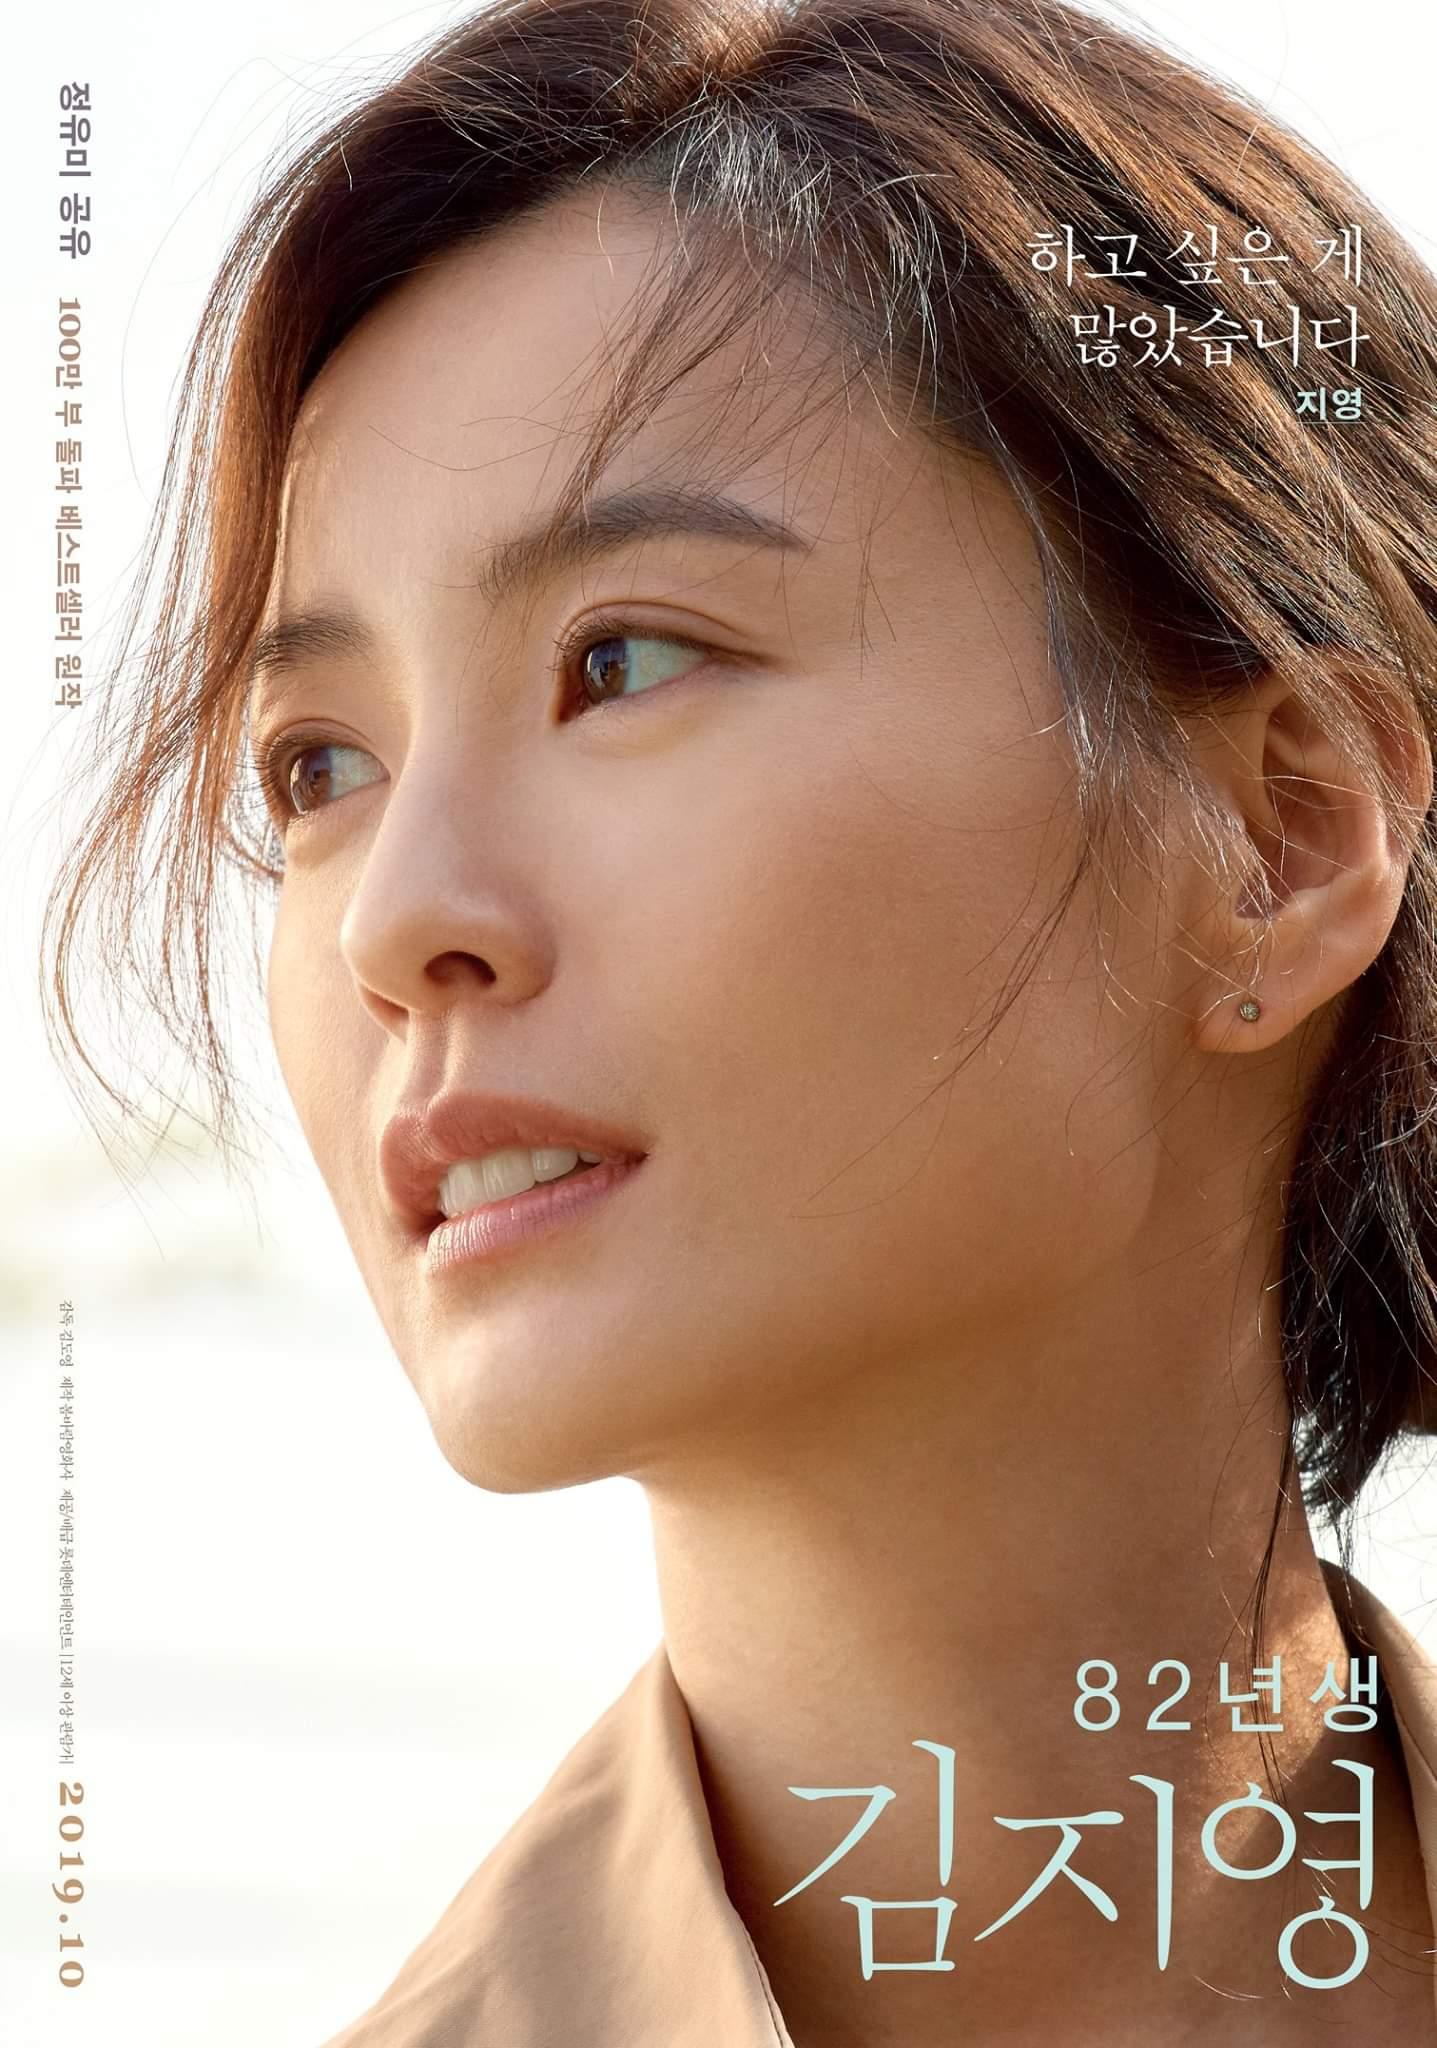 https://0.soompi.io/wp-content/uploads/2019/10/07200852/Jung-Yu-Mi.jpg